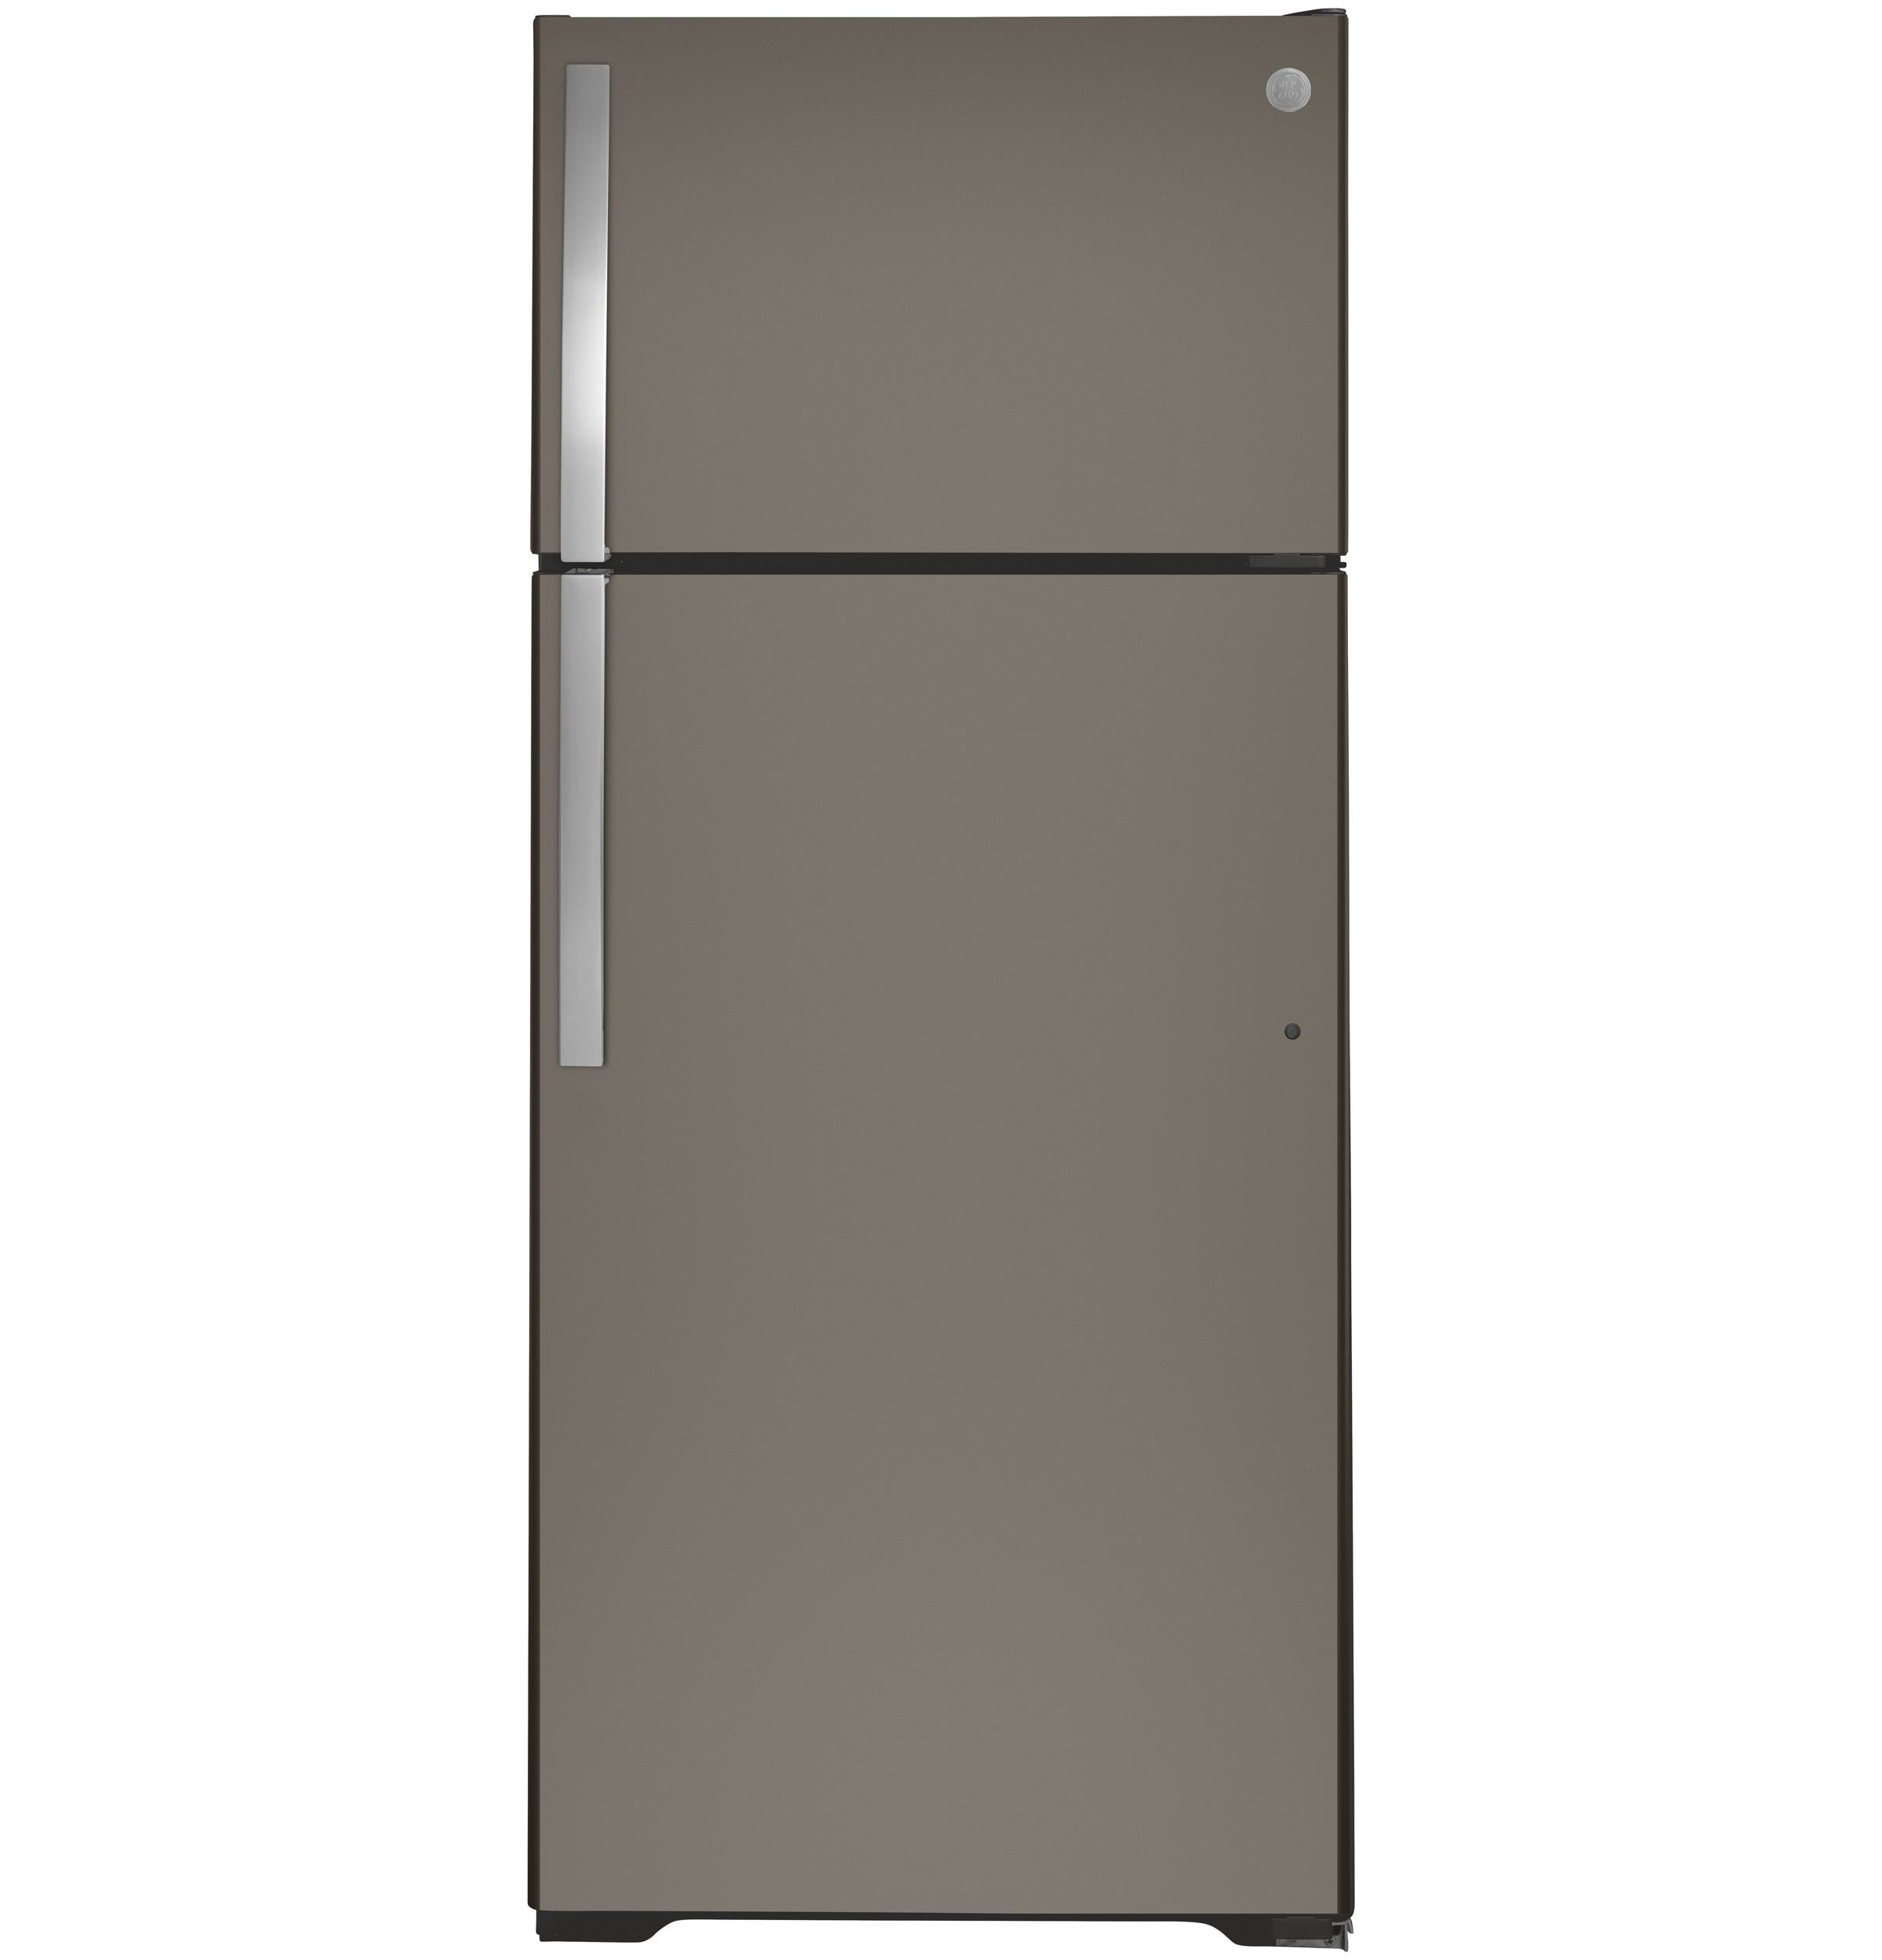 GE GE® 17.5 Cu. Ft. Top-Freezer Refrigerator